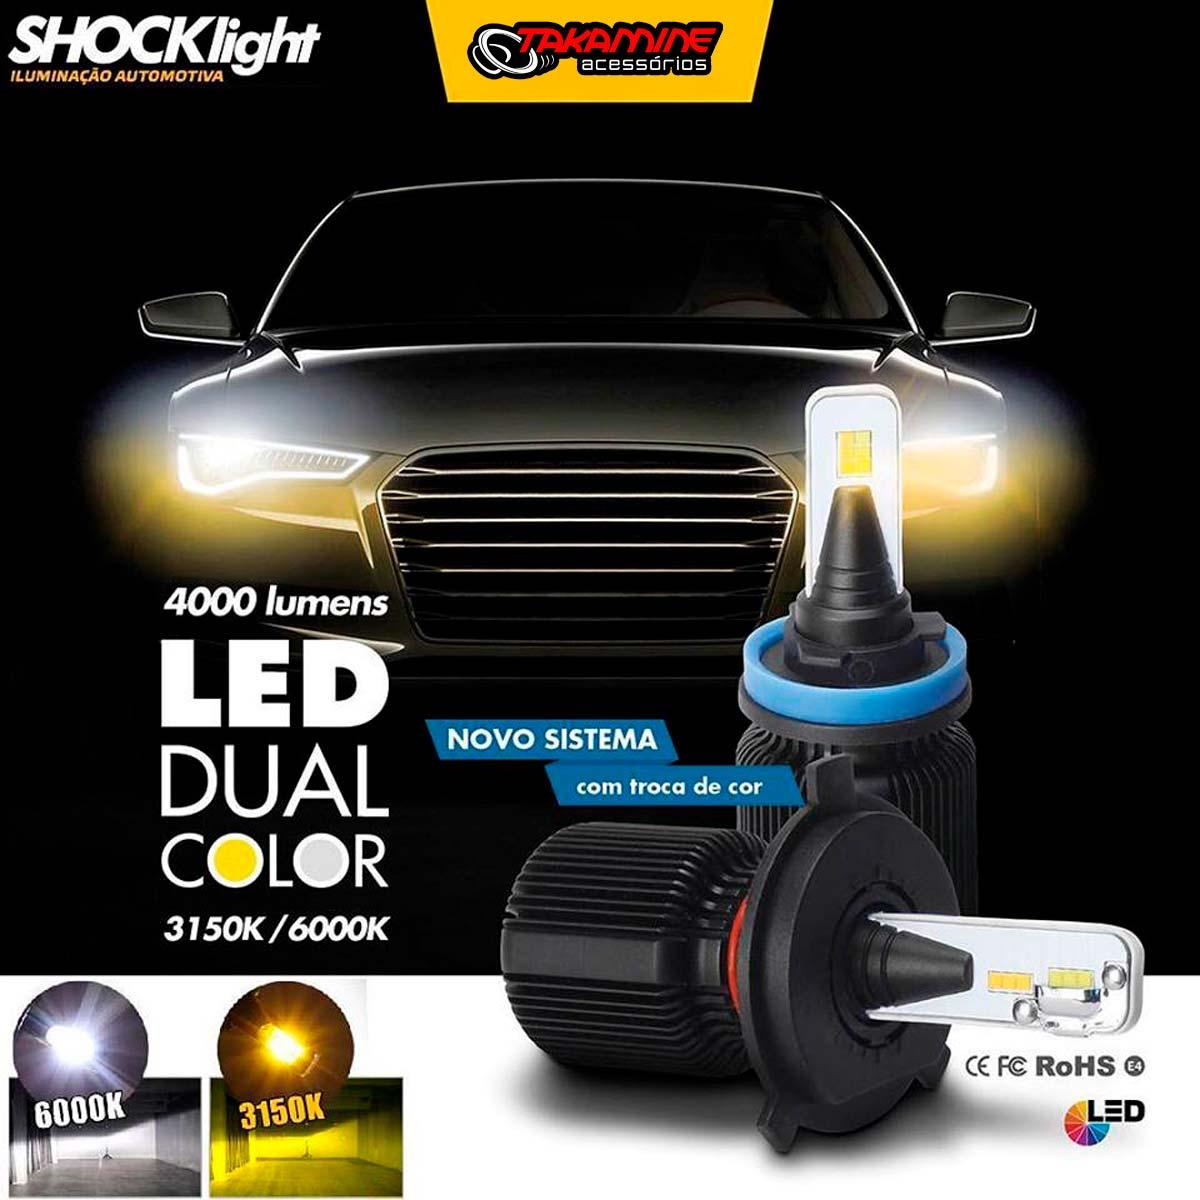 Kit de lâmpadas LED Dual Color Headlight Shocklight  tipo xenon H13 25W ilumina branco e amarelo